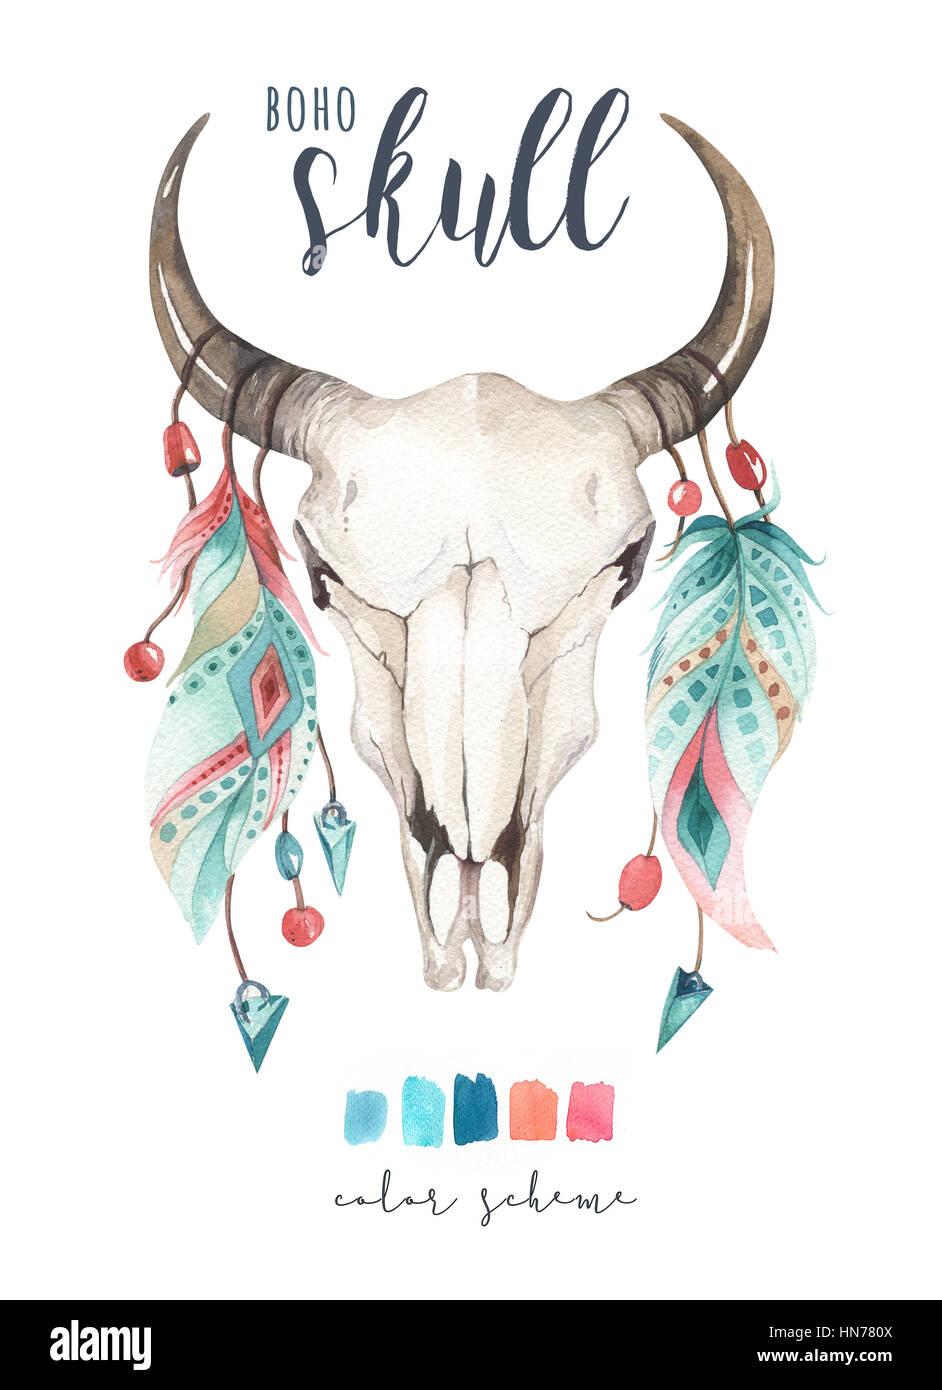 watercolor bohemian cow skull western mammals deer skull logo design Deer Skull Logo Decal